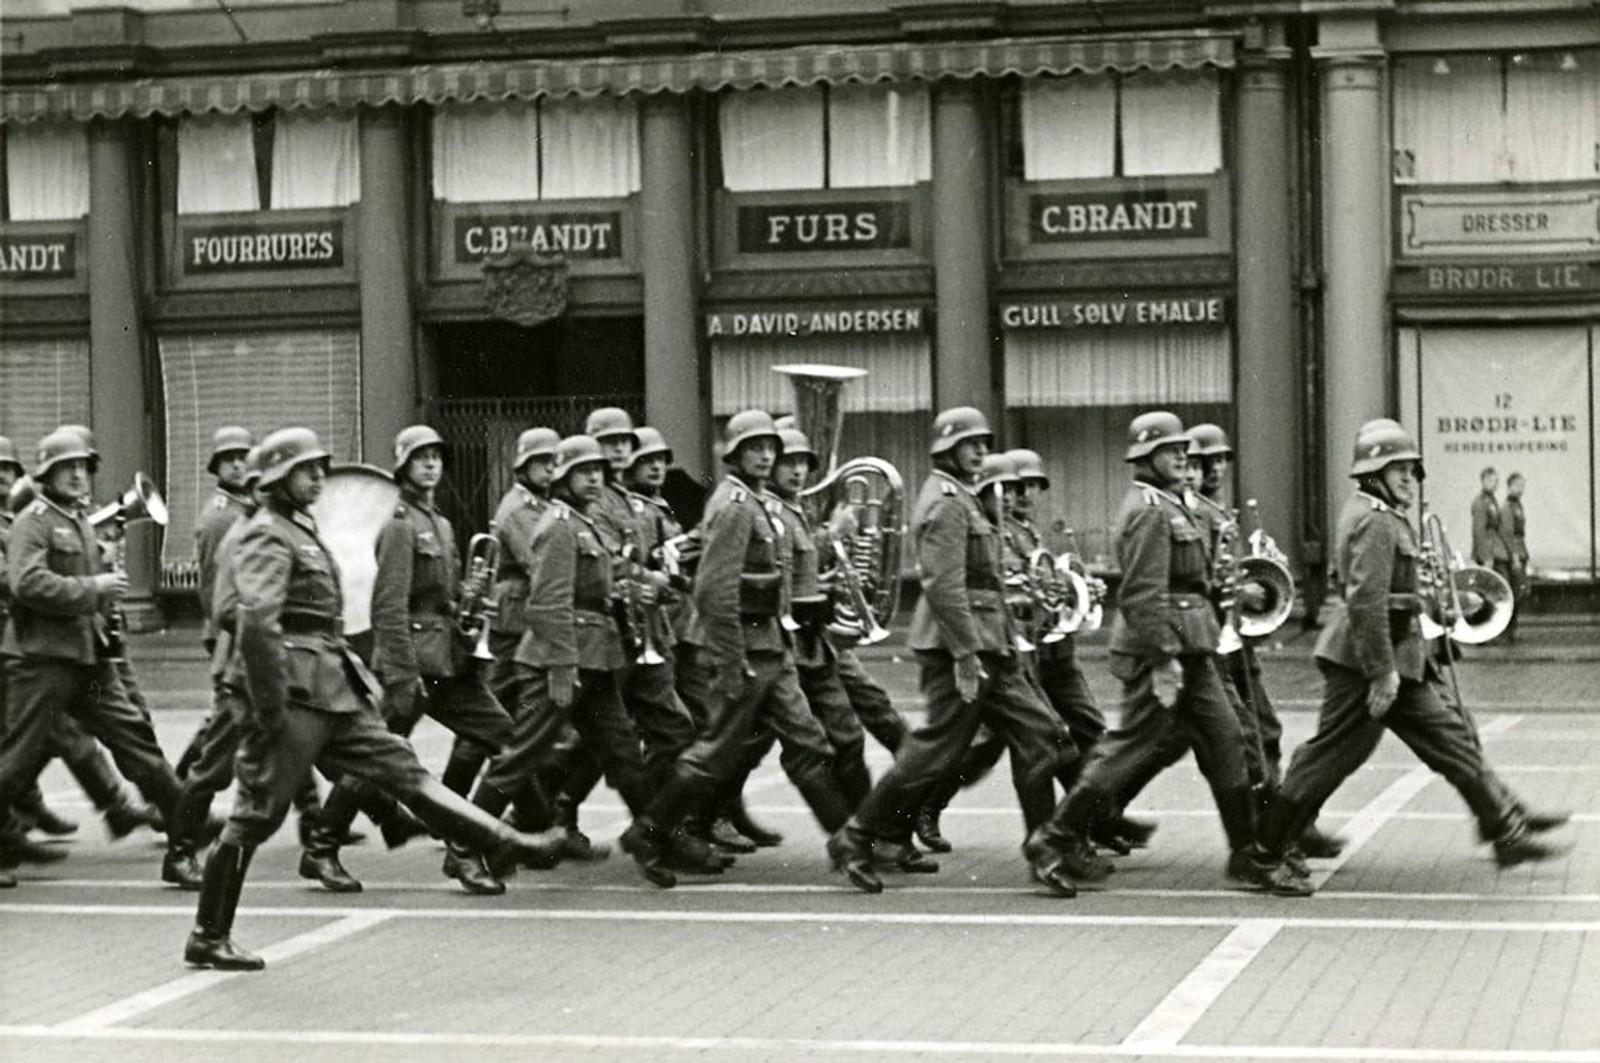 Tyske soldater marsjerer på Torgallmenningen i 1940.